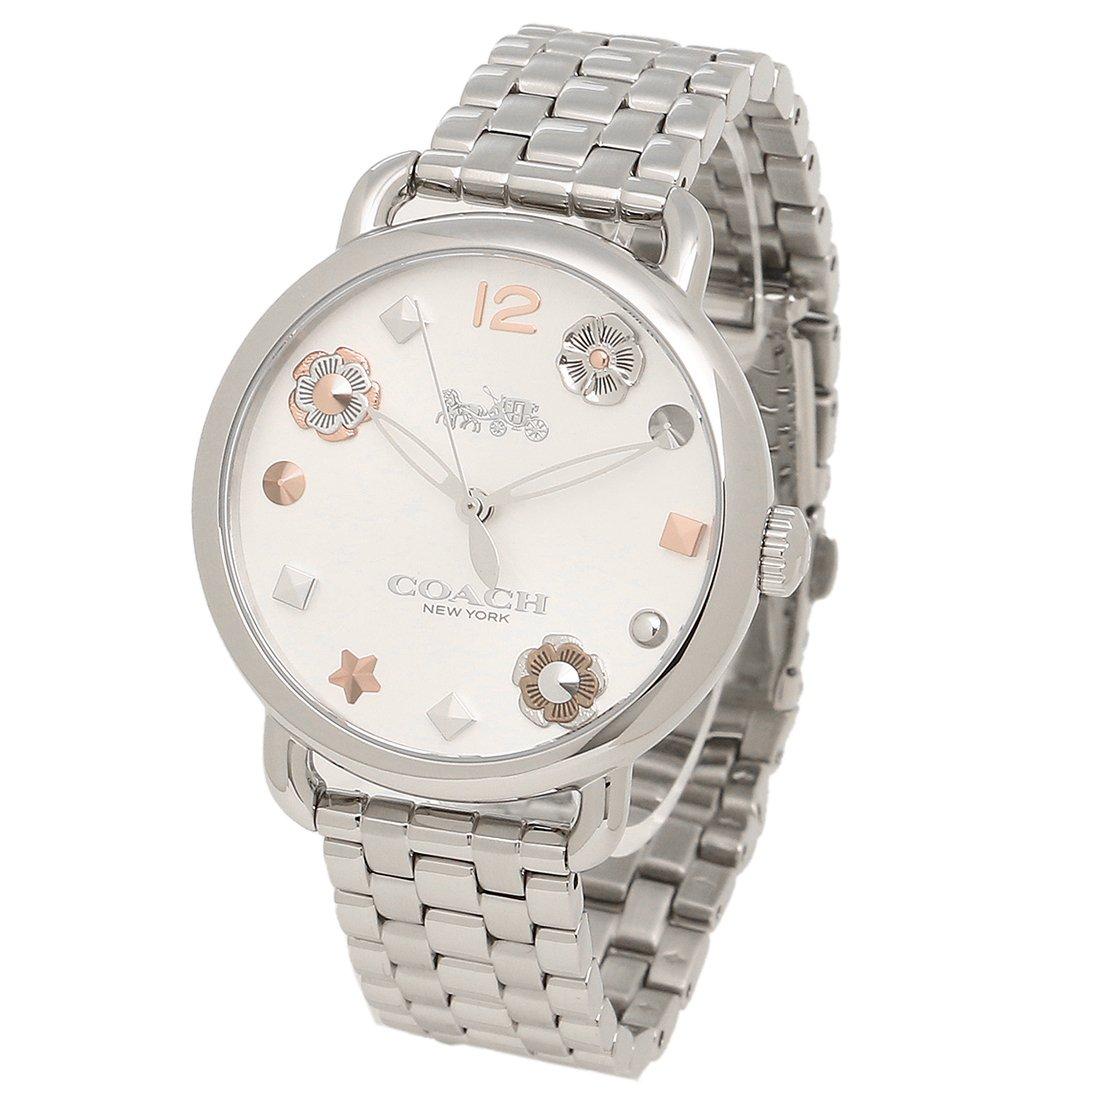 6a094da459 Amazon | [コーチ] 腕時計 レディース COACH 14502810 シルバー [並行輸入品] | 並行輸入品・逆輸入品・中古品(レディース)  | 腕時計 通販